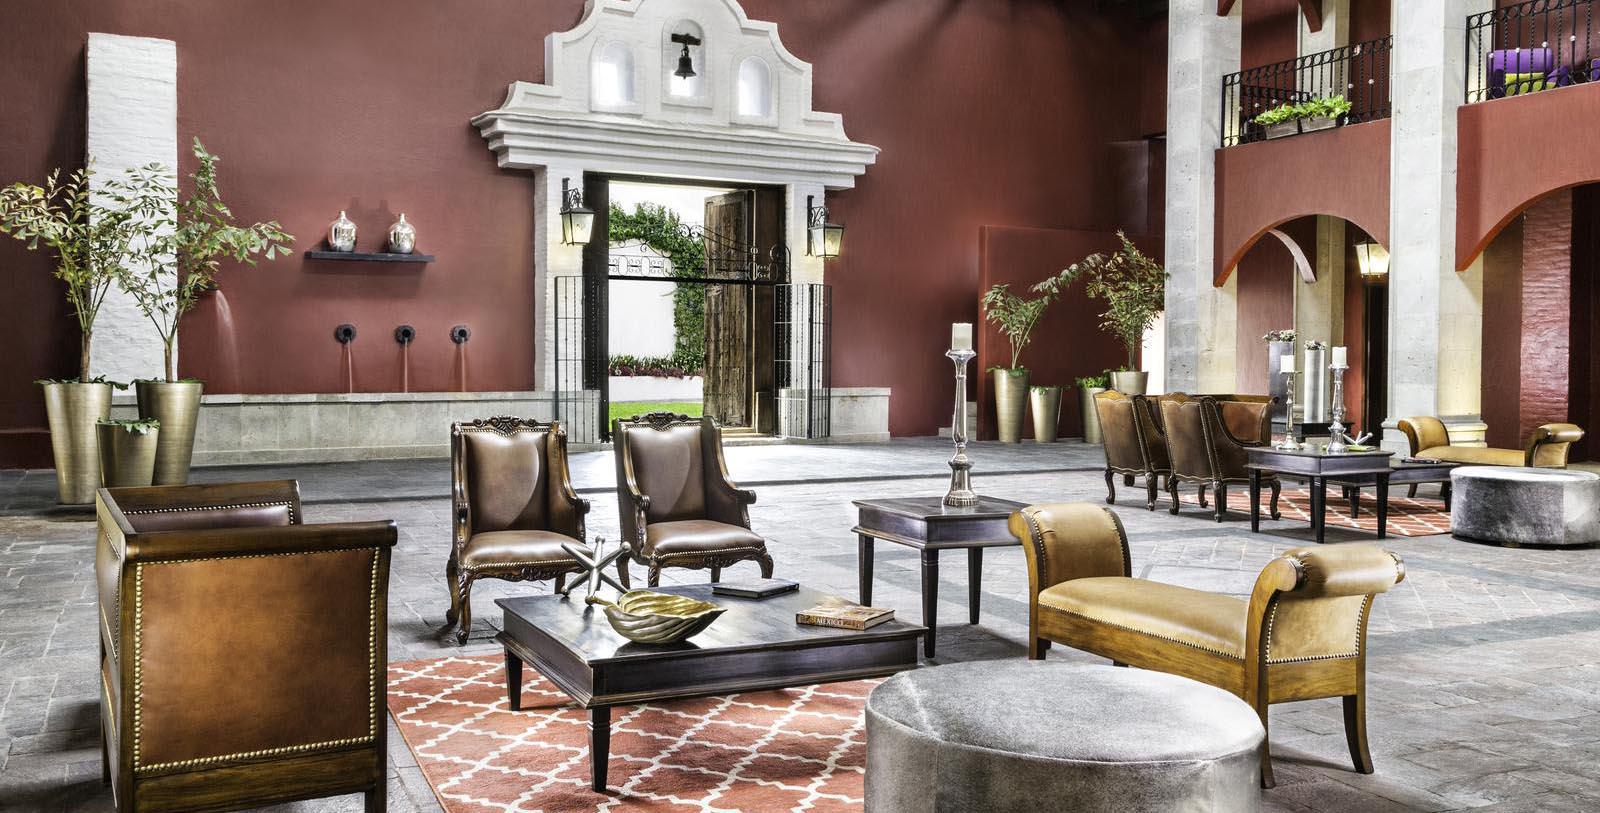 Image of Lobby Seating, Hotel Gran Casa Xalisco, Guadalajara, Mexico, 1894, Member of Historic Hotels Worldwide, Explore